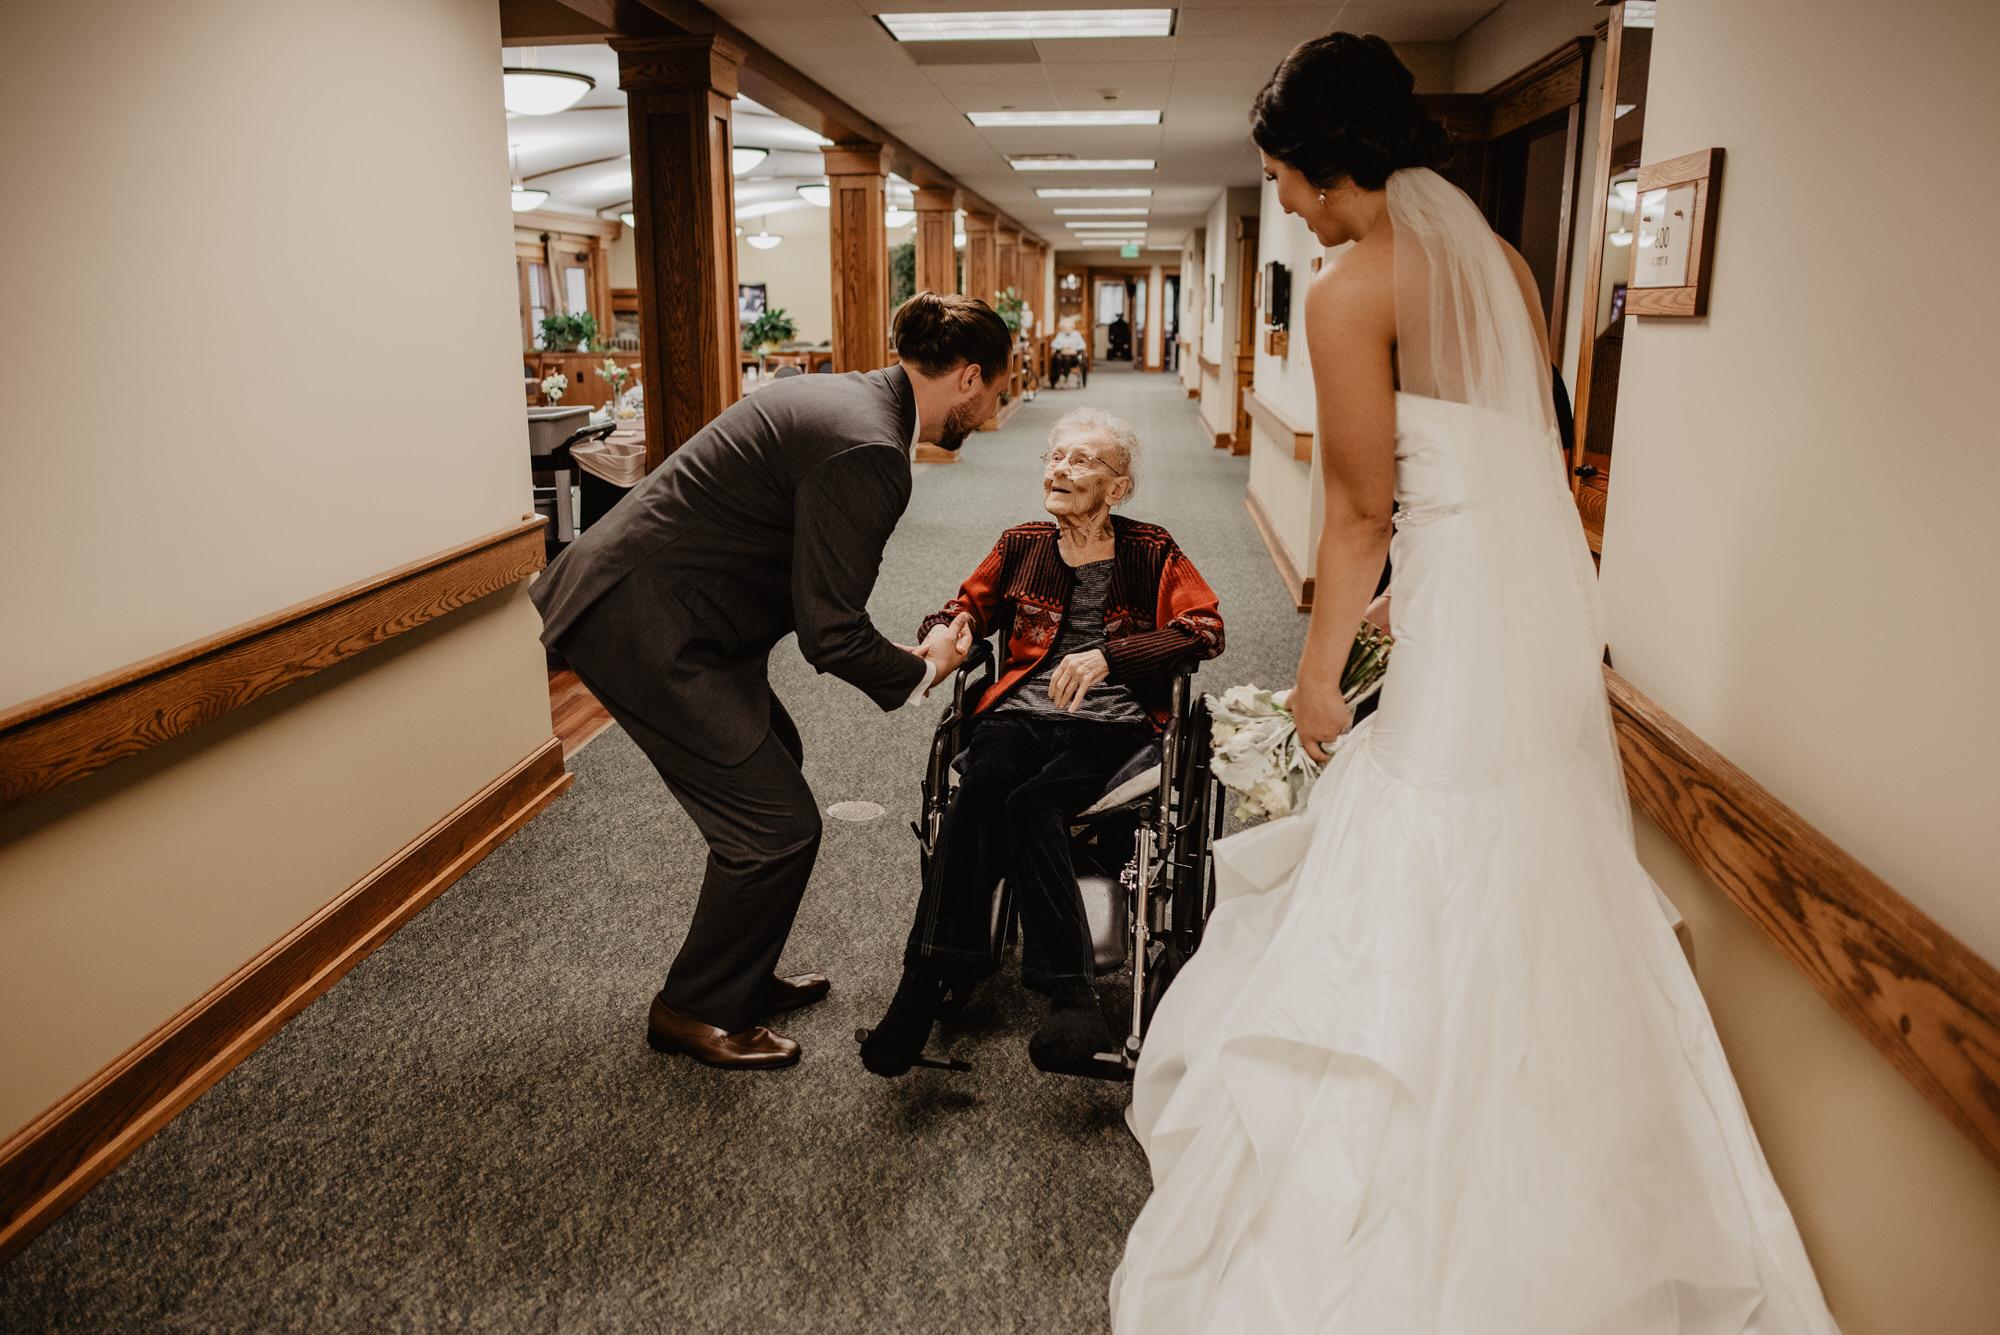 Kaylie_Sirek_Photography_Grand_Island_Kearney_Hastings_Lincoln_Nebraska_Wedding_Engagement_Grandma_Grandparent_Delray_Downtown_DowntownLincoln_LNK_Emotional_Bride_Groom_Photographer_33.jpg